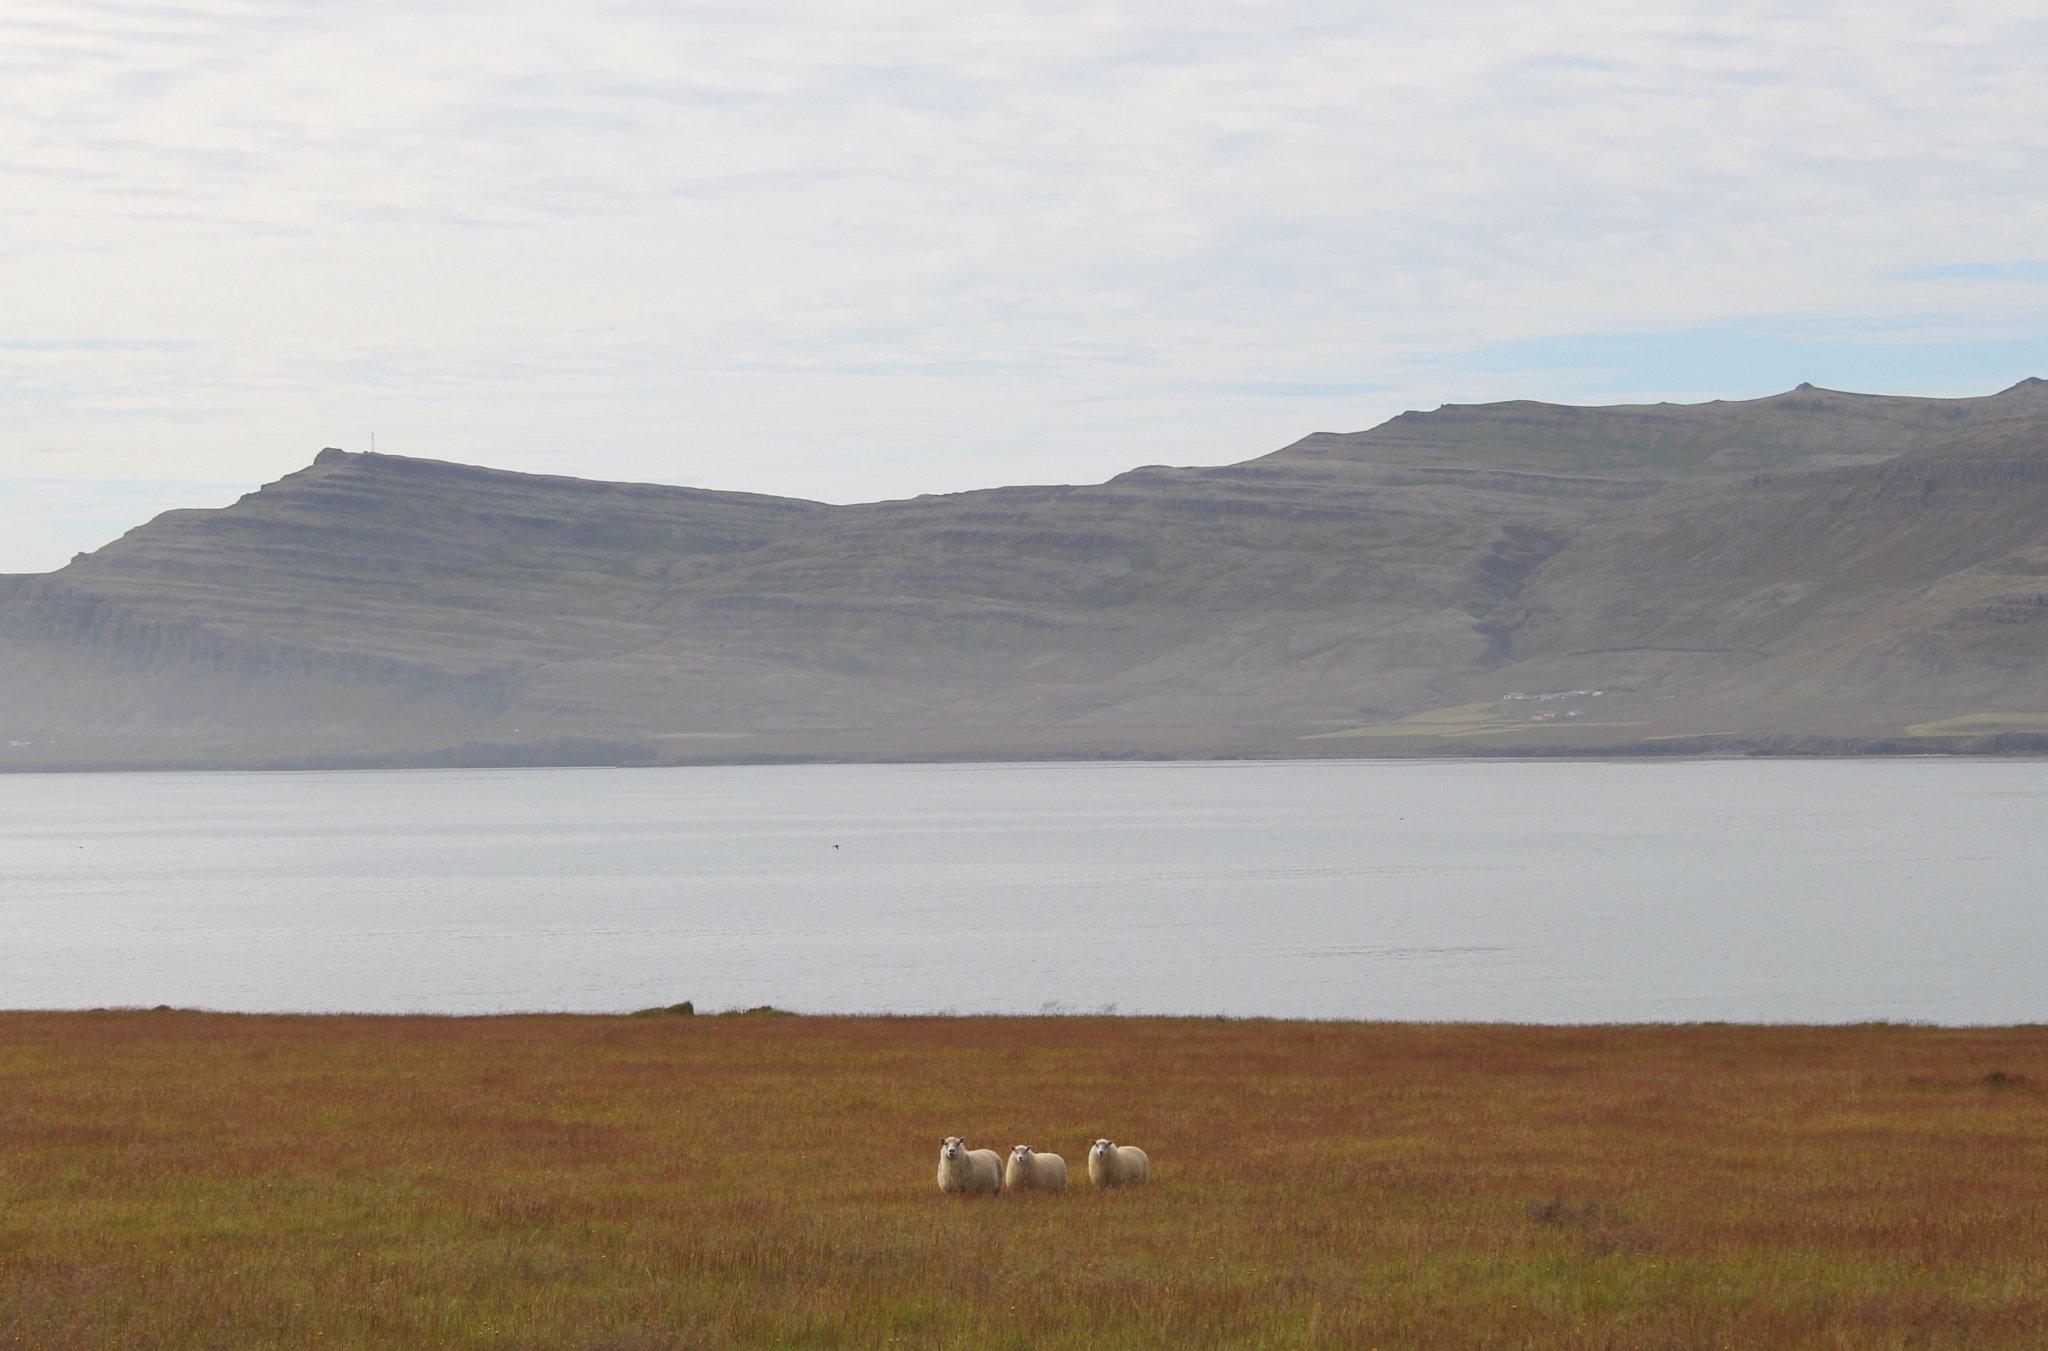 Landscape with Icelandic sheep